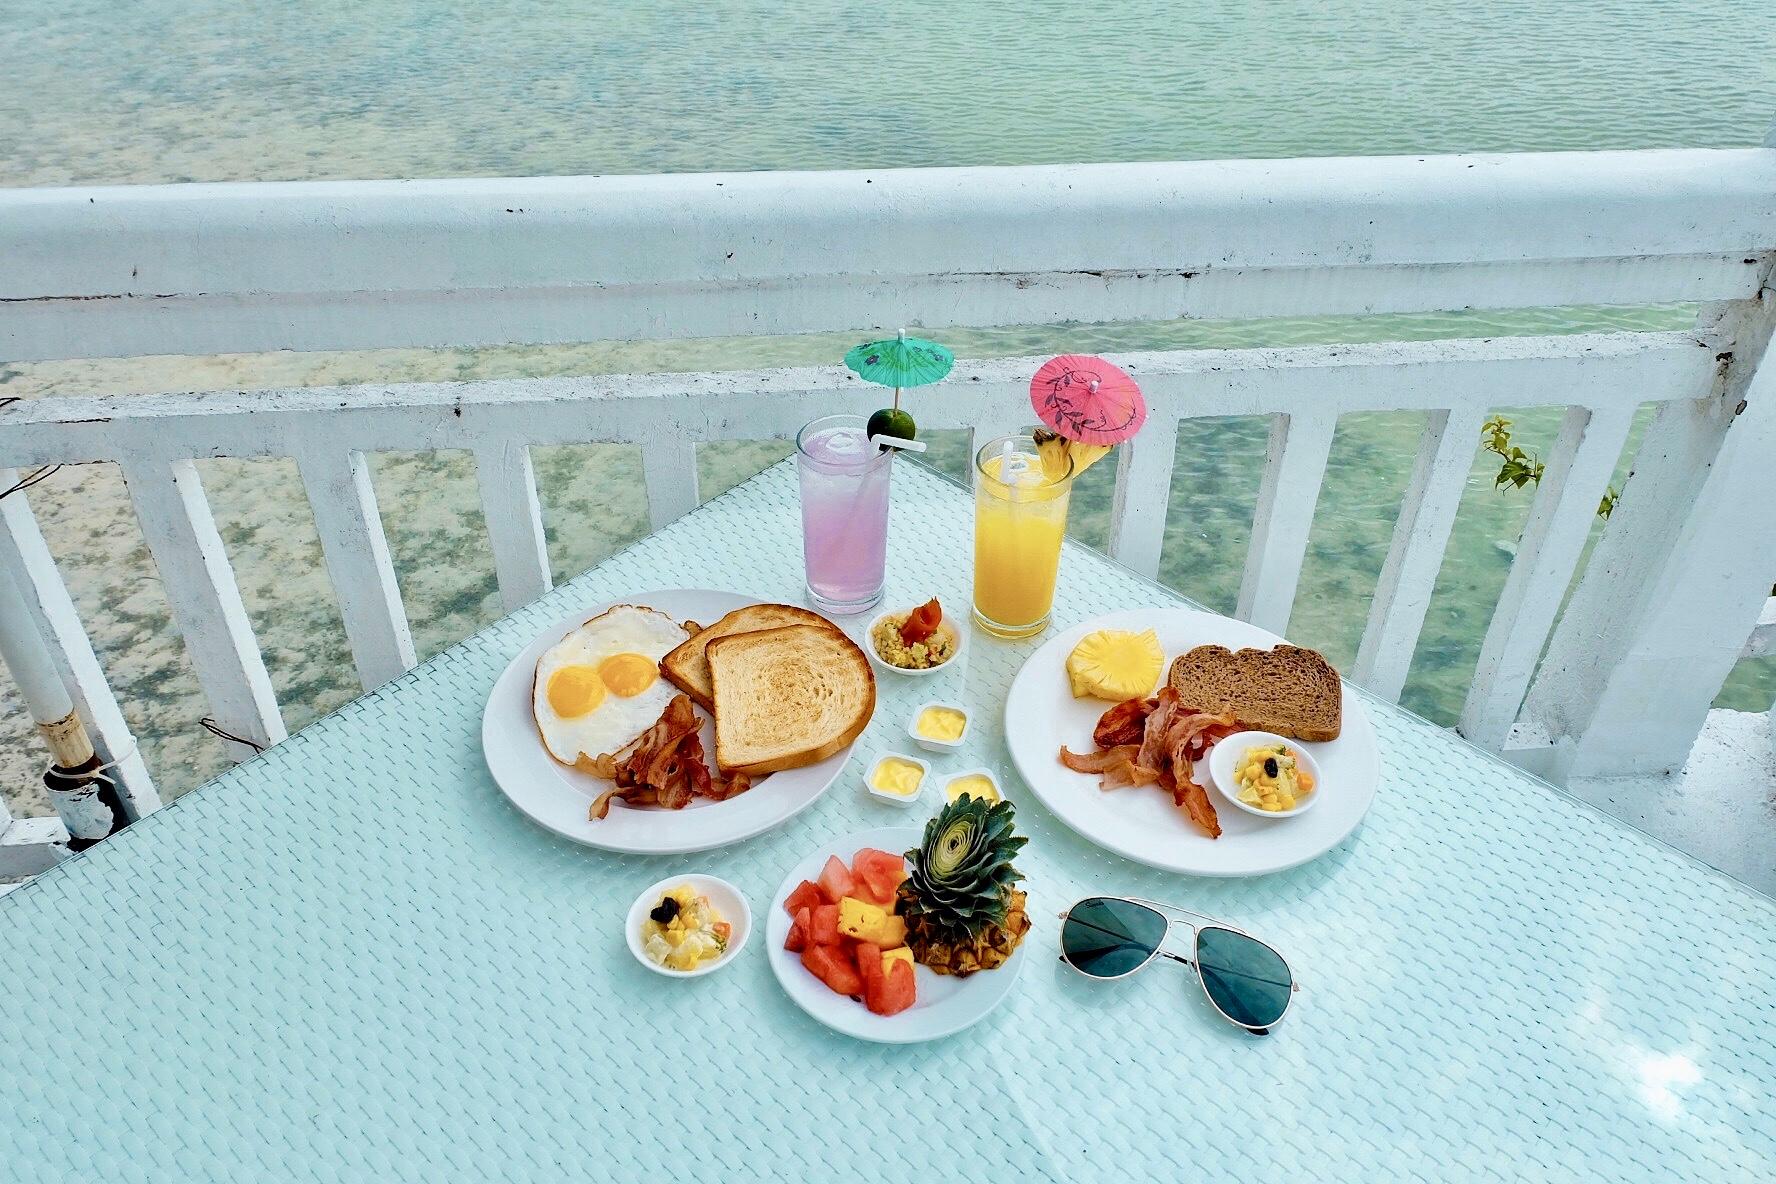 pacific-cebu-resort-iamkimcharlie-11